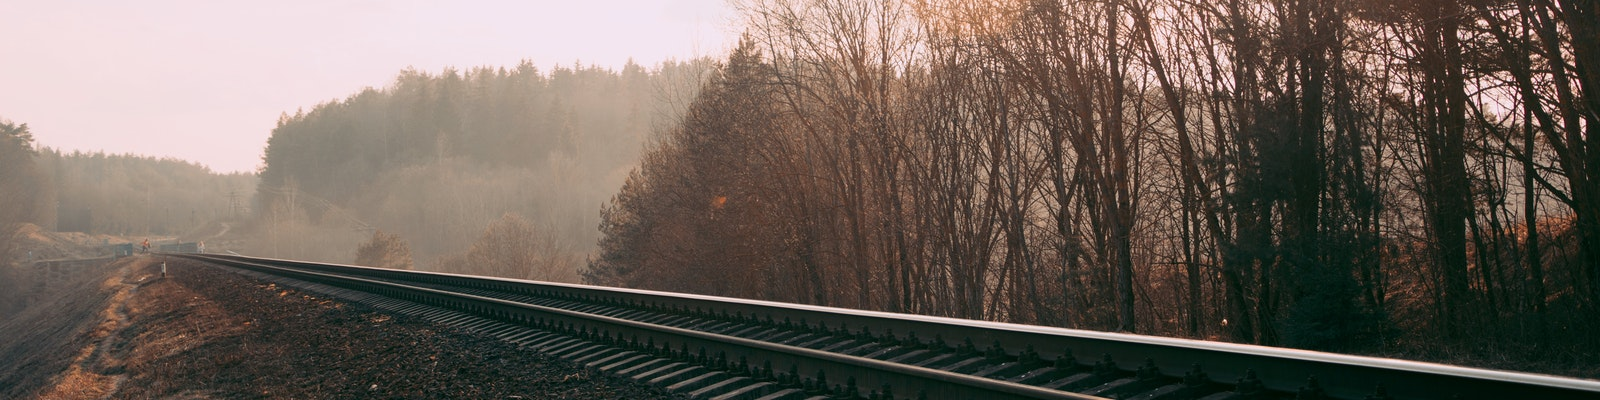 Robert Șerban – Puțin sub linie